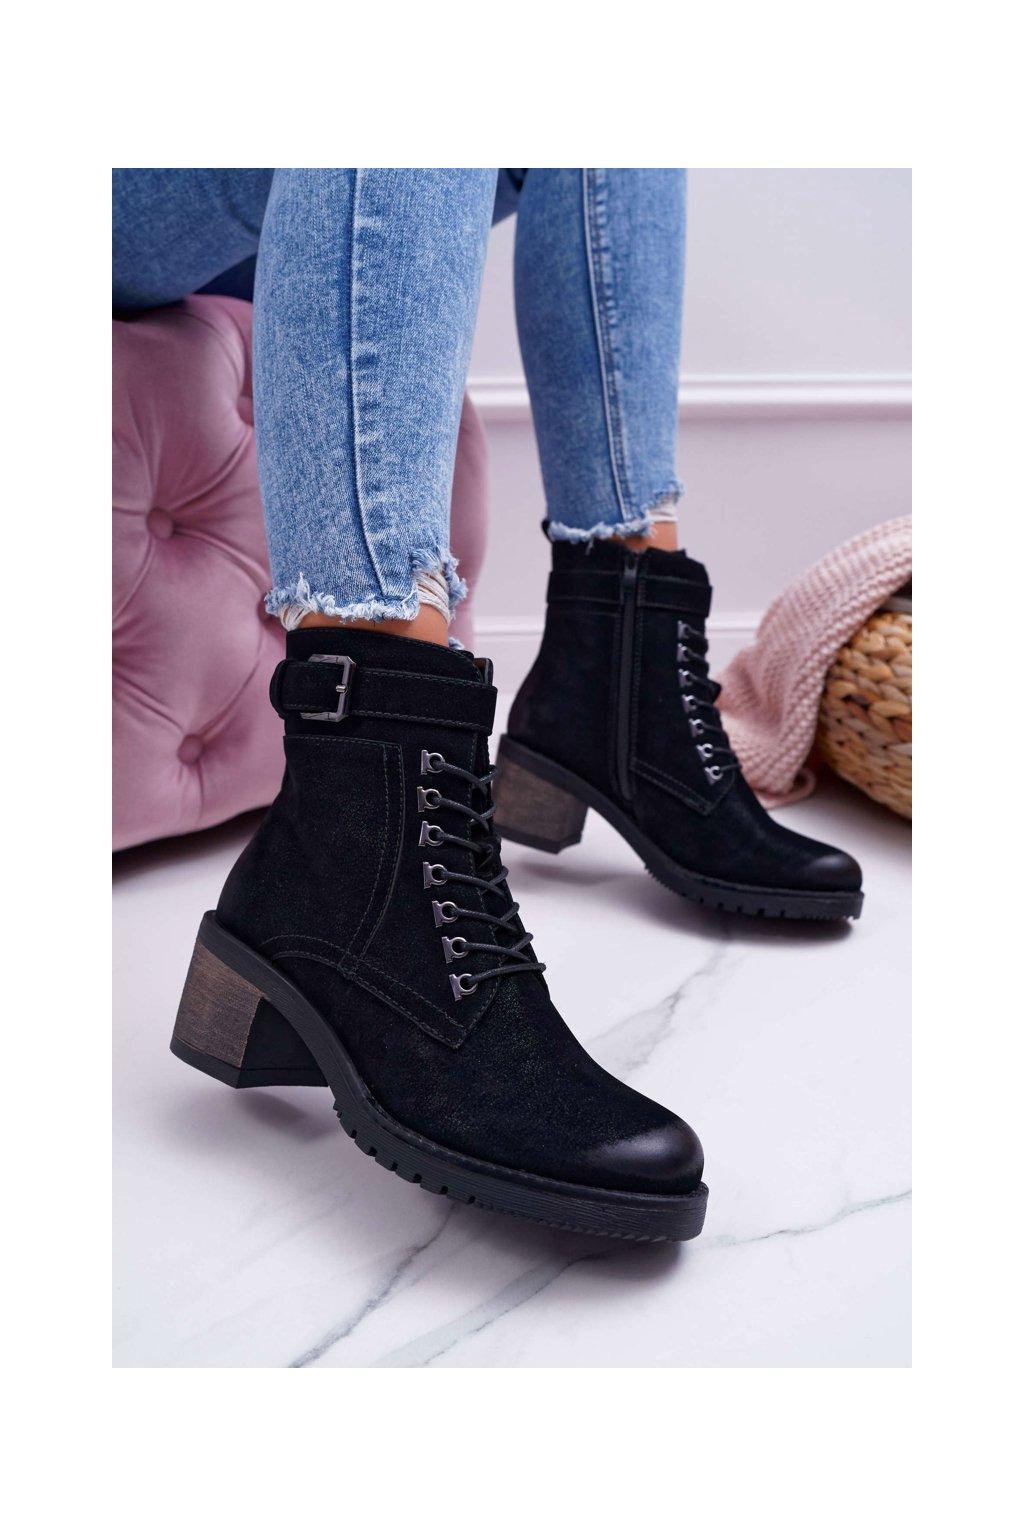 Dámske členkové topánky na podpätku Sergio Leone čierne BT705